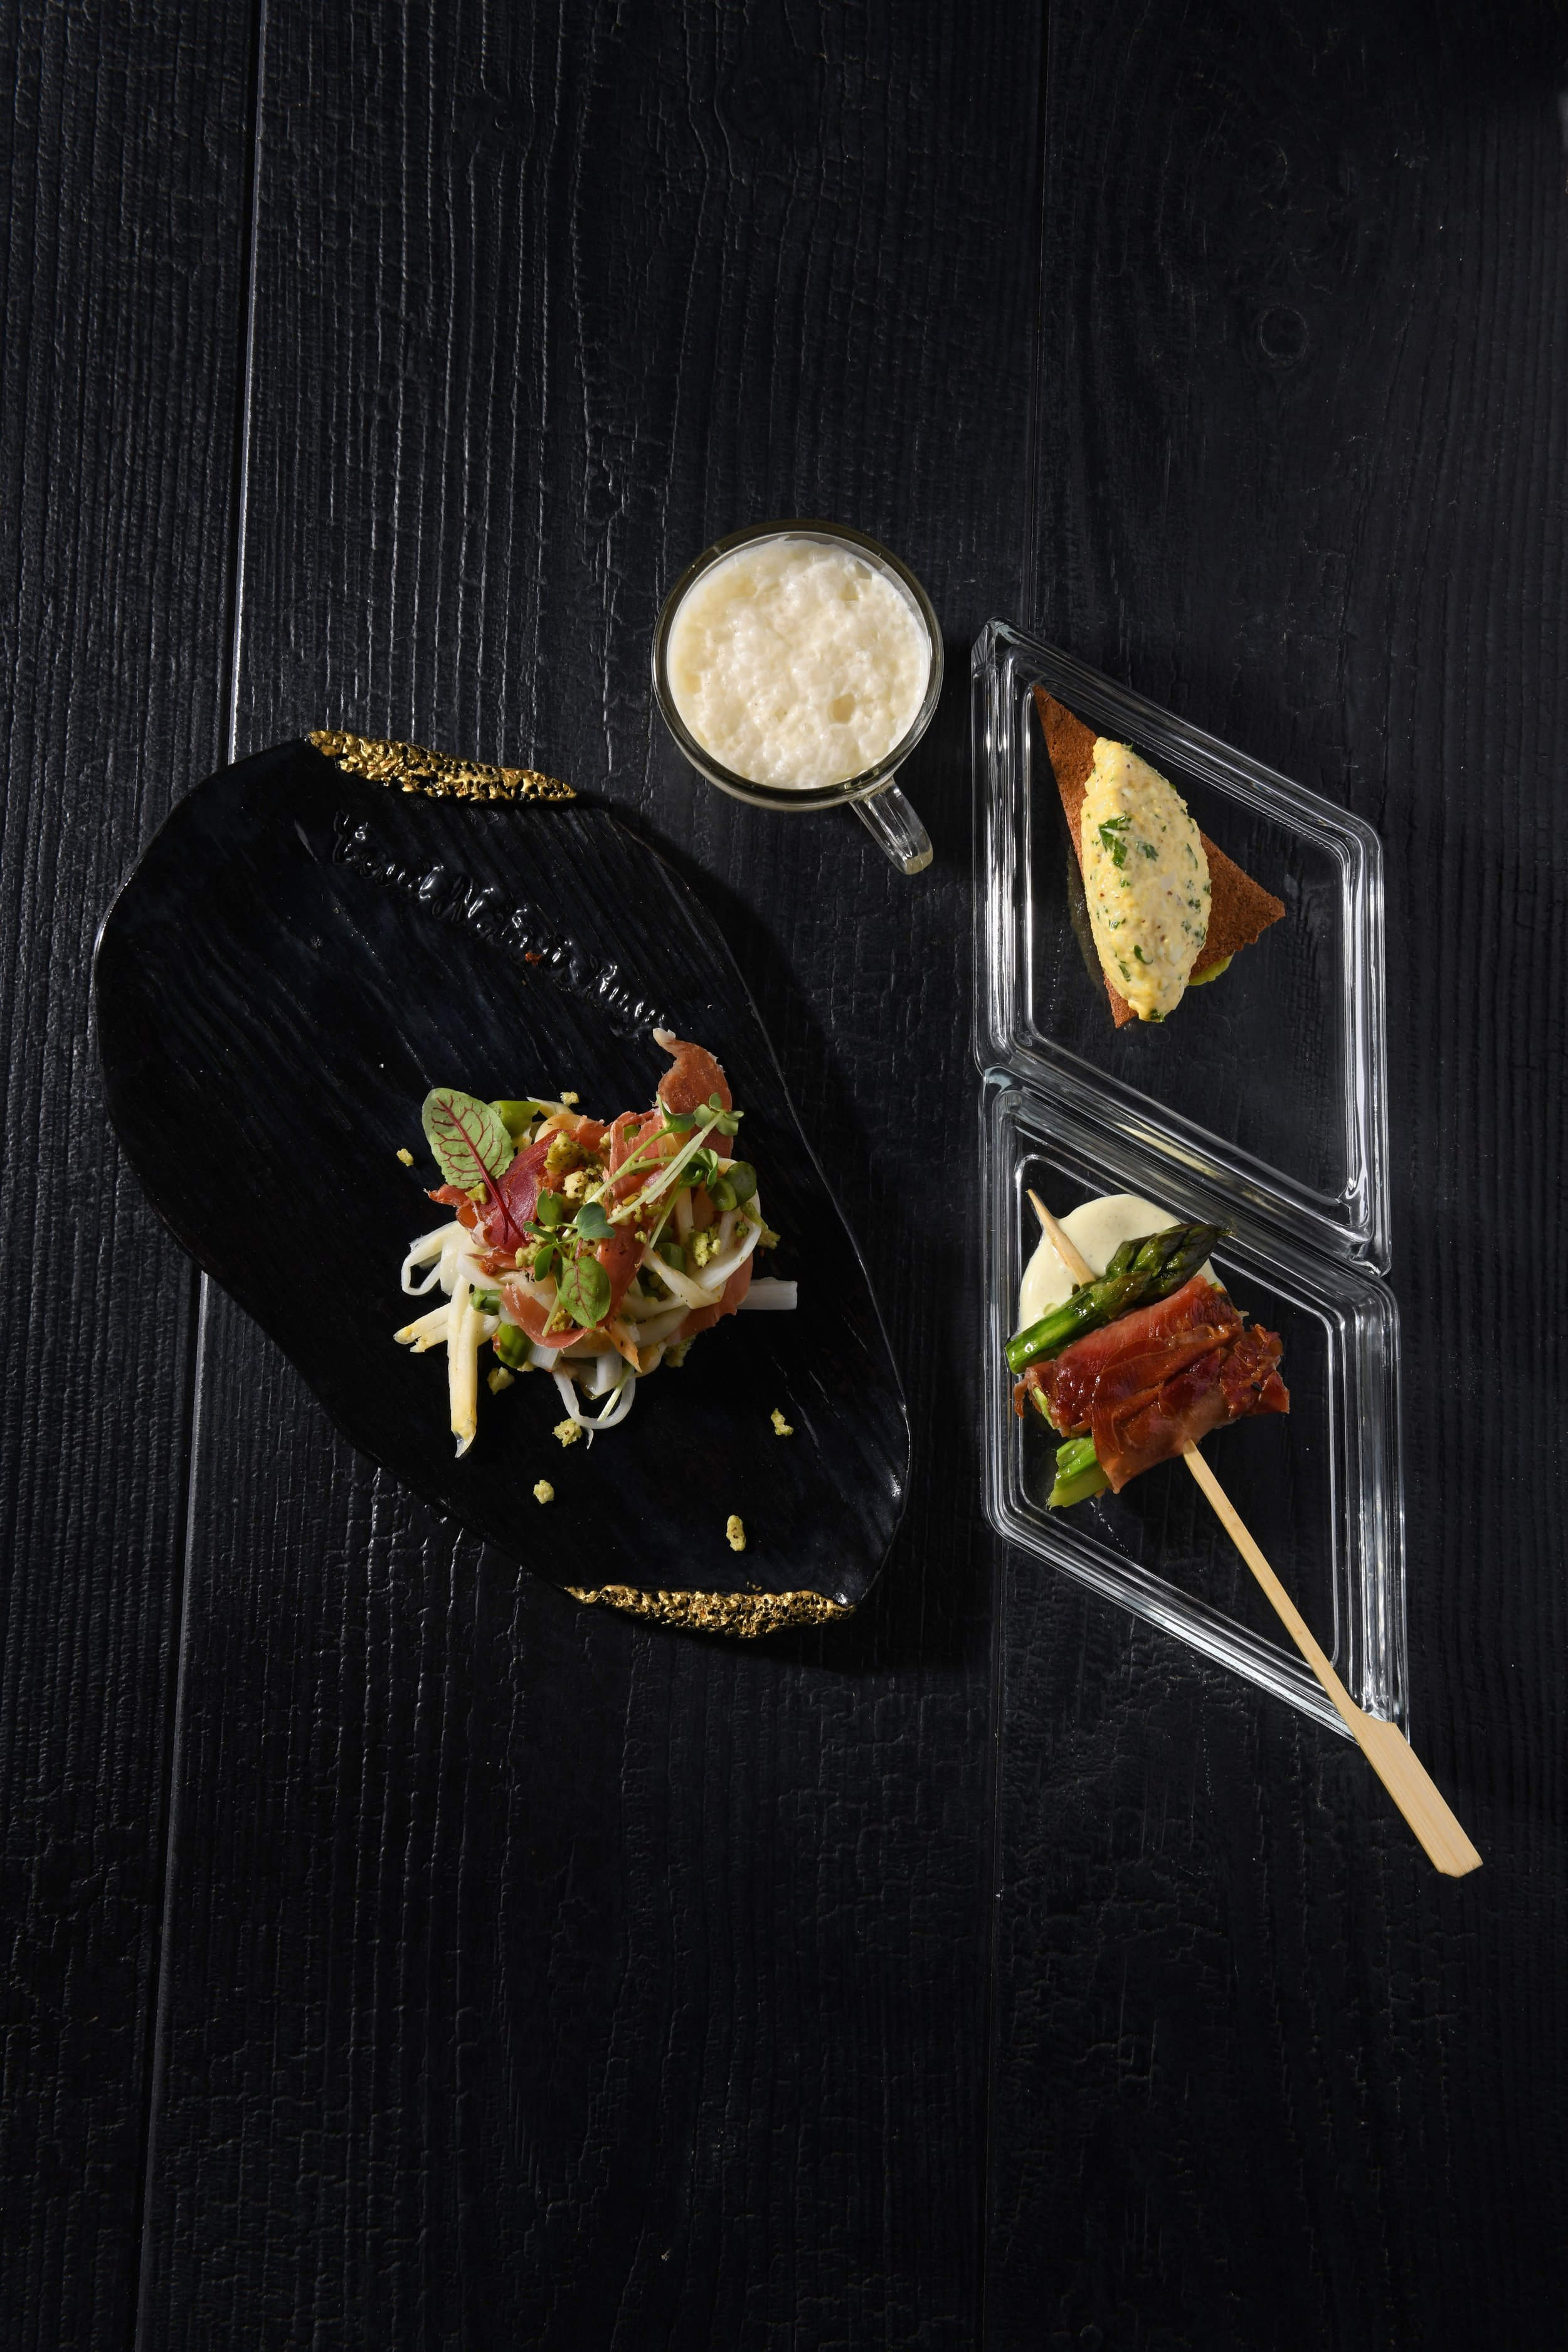 15 restaurant brasserie oud notarishuis ninove bart albrecht tablefever .jpg